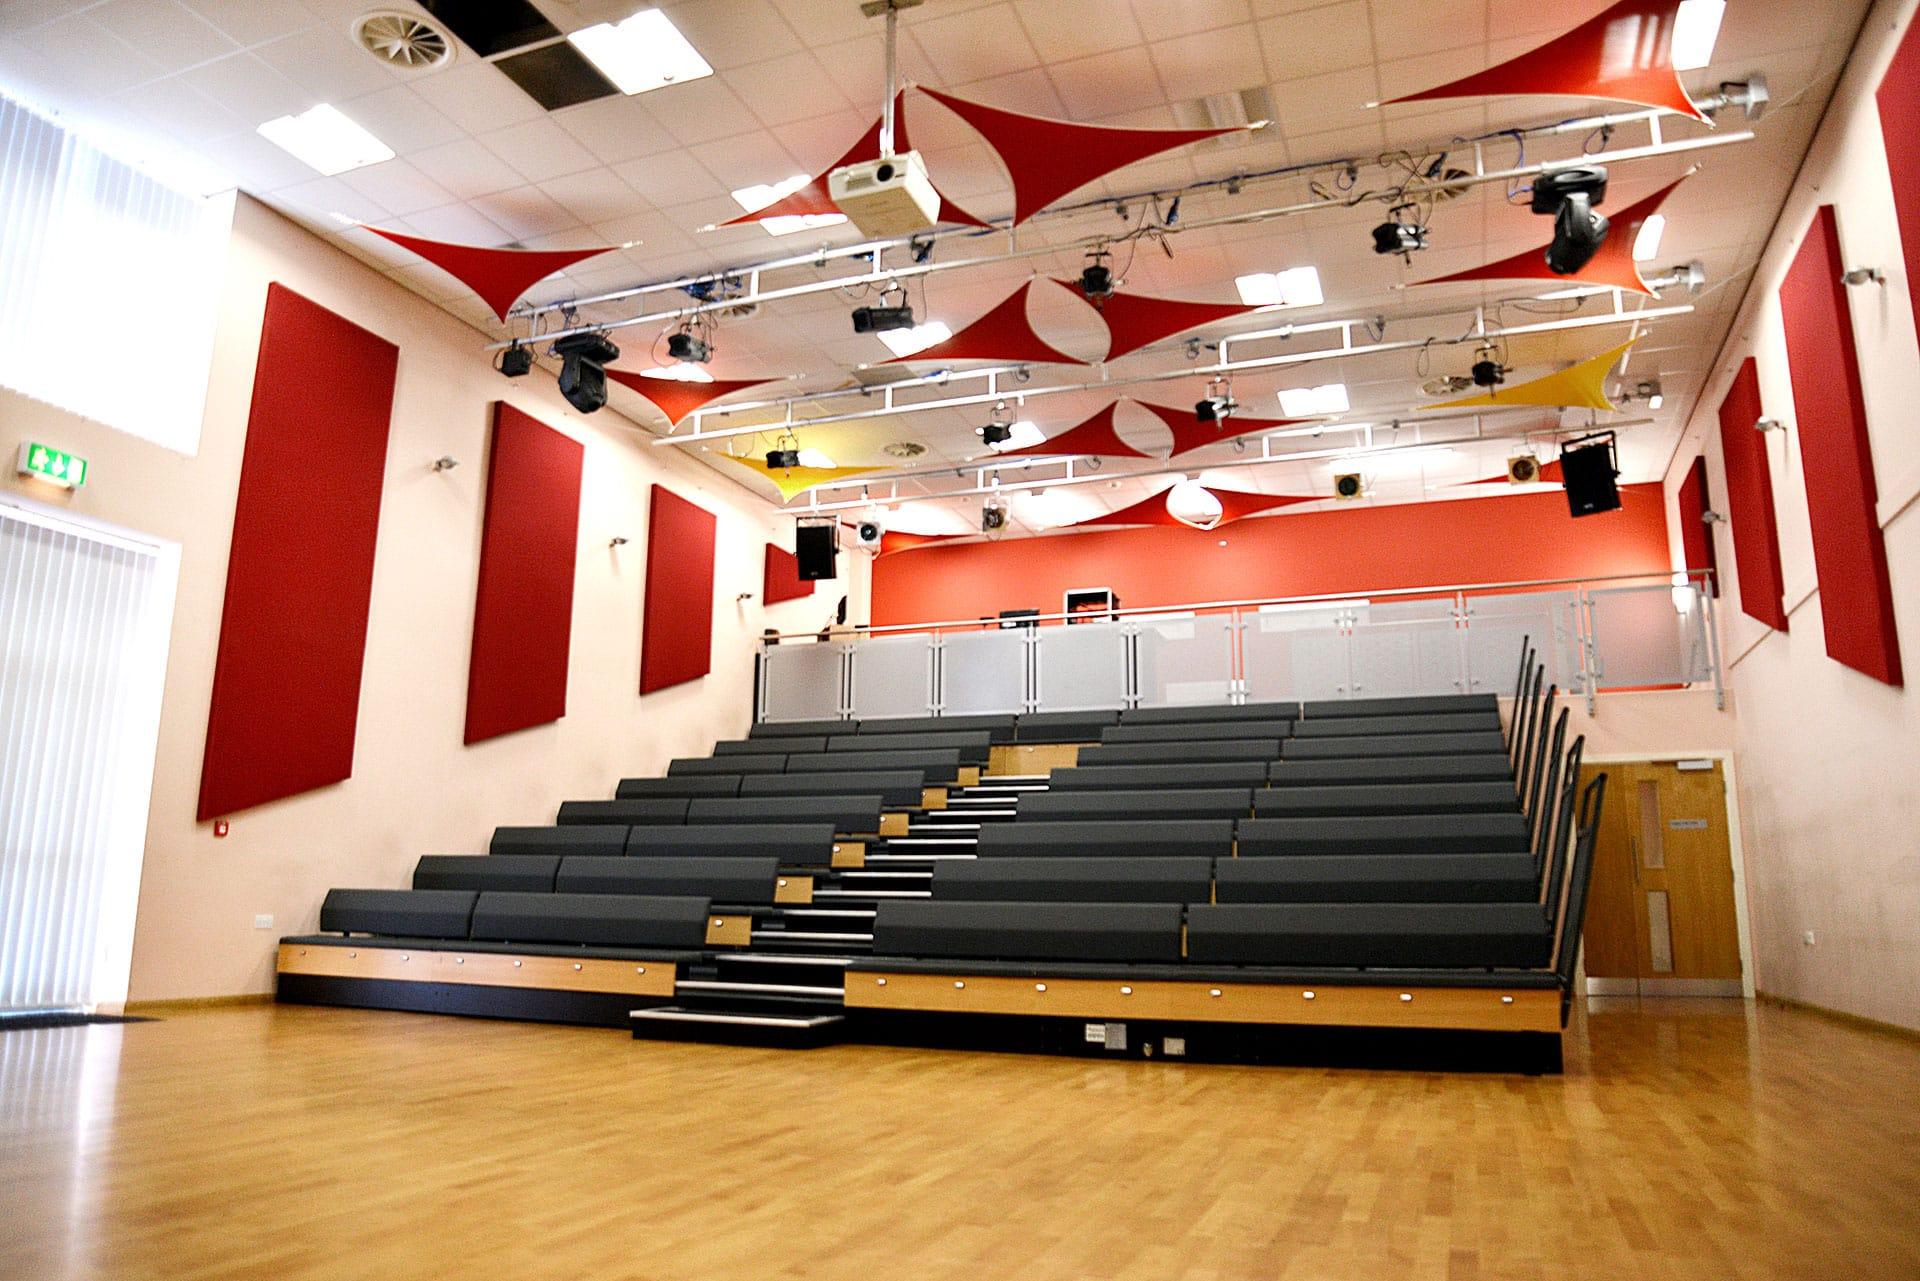 Theatre floorplan